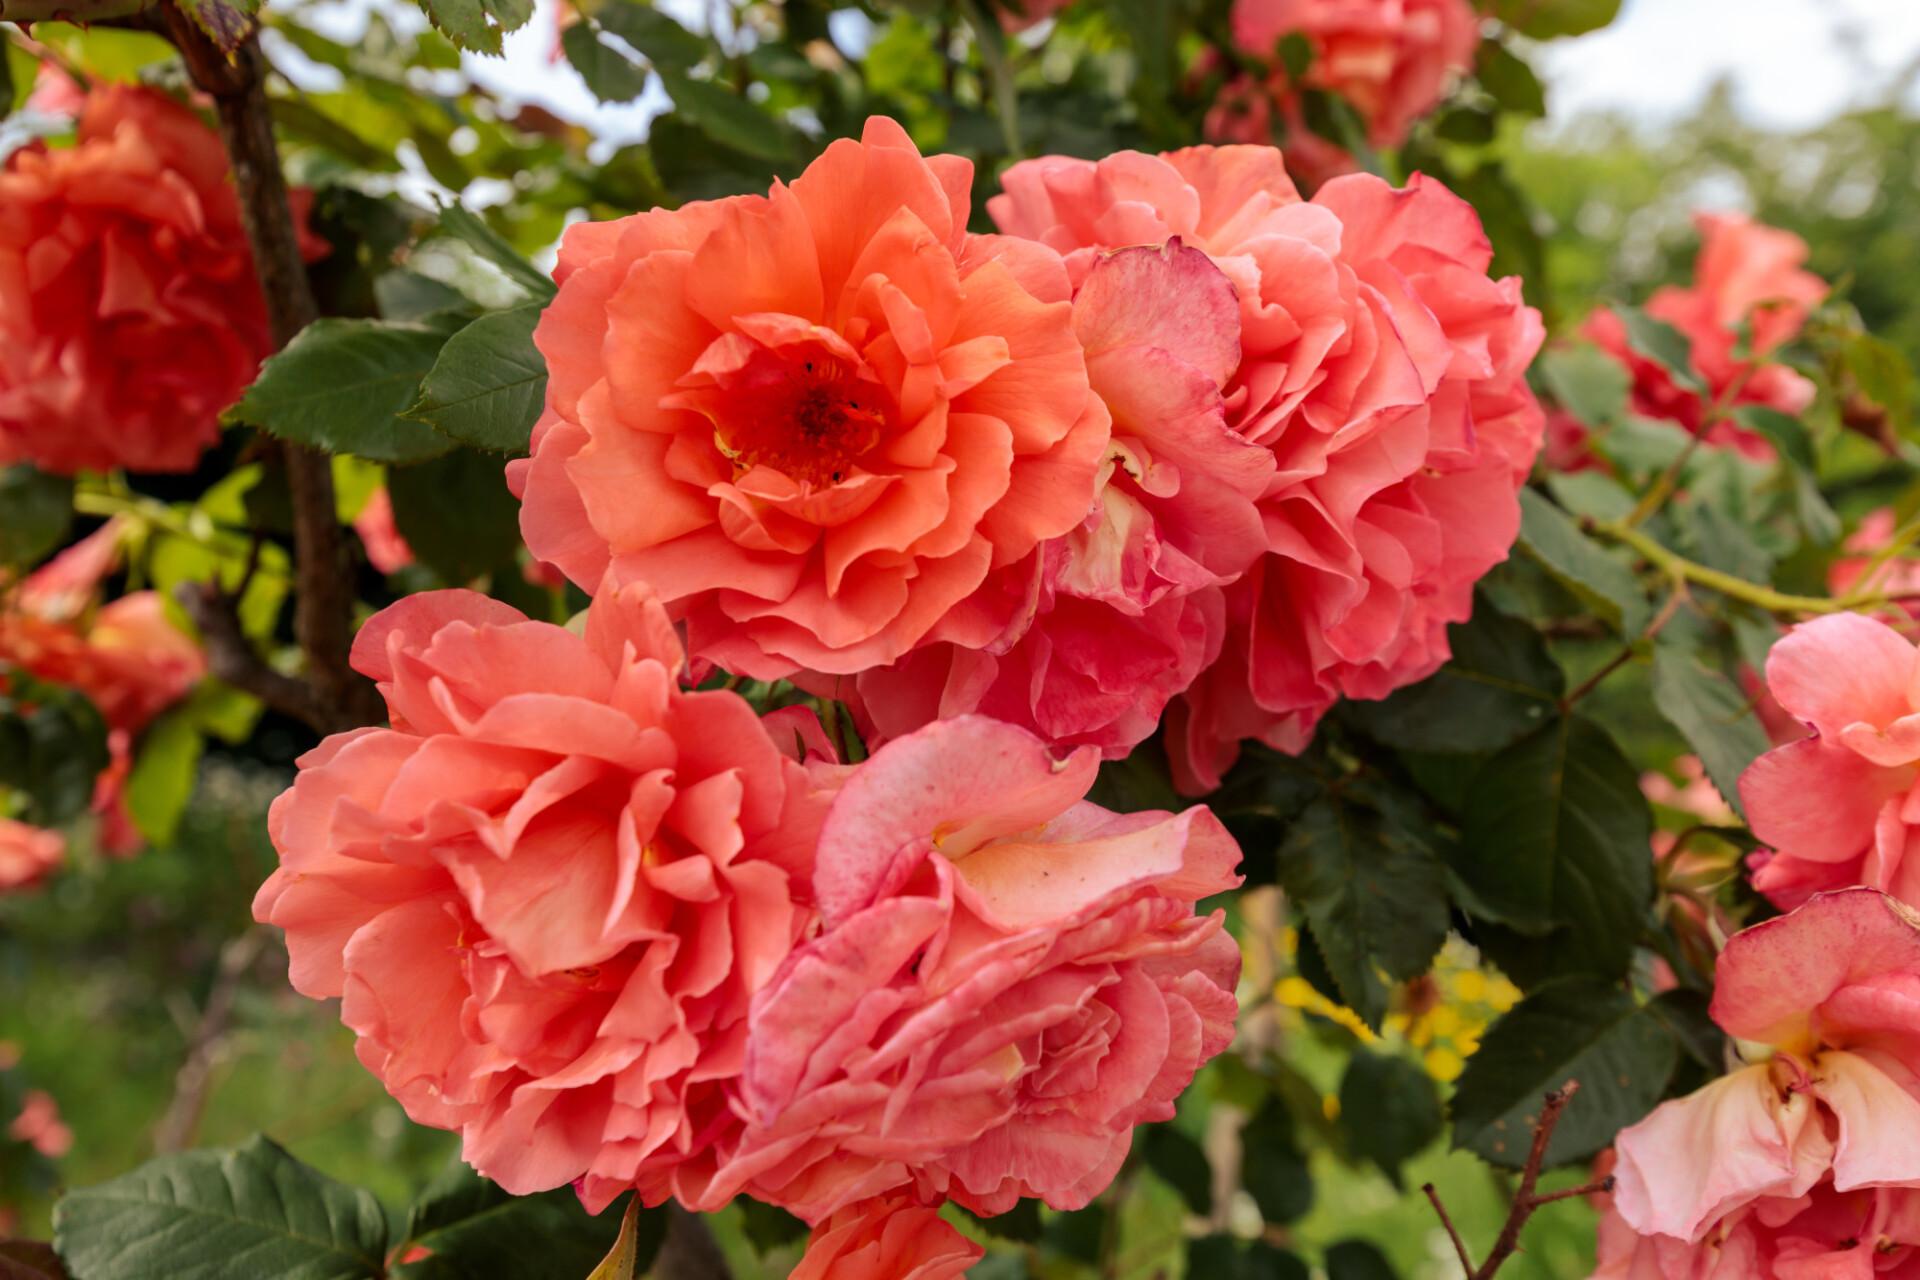 Pink Reddish Roses